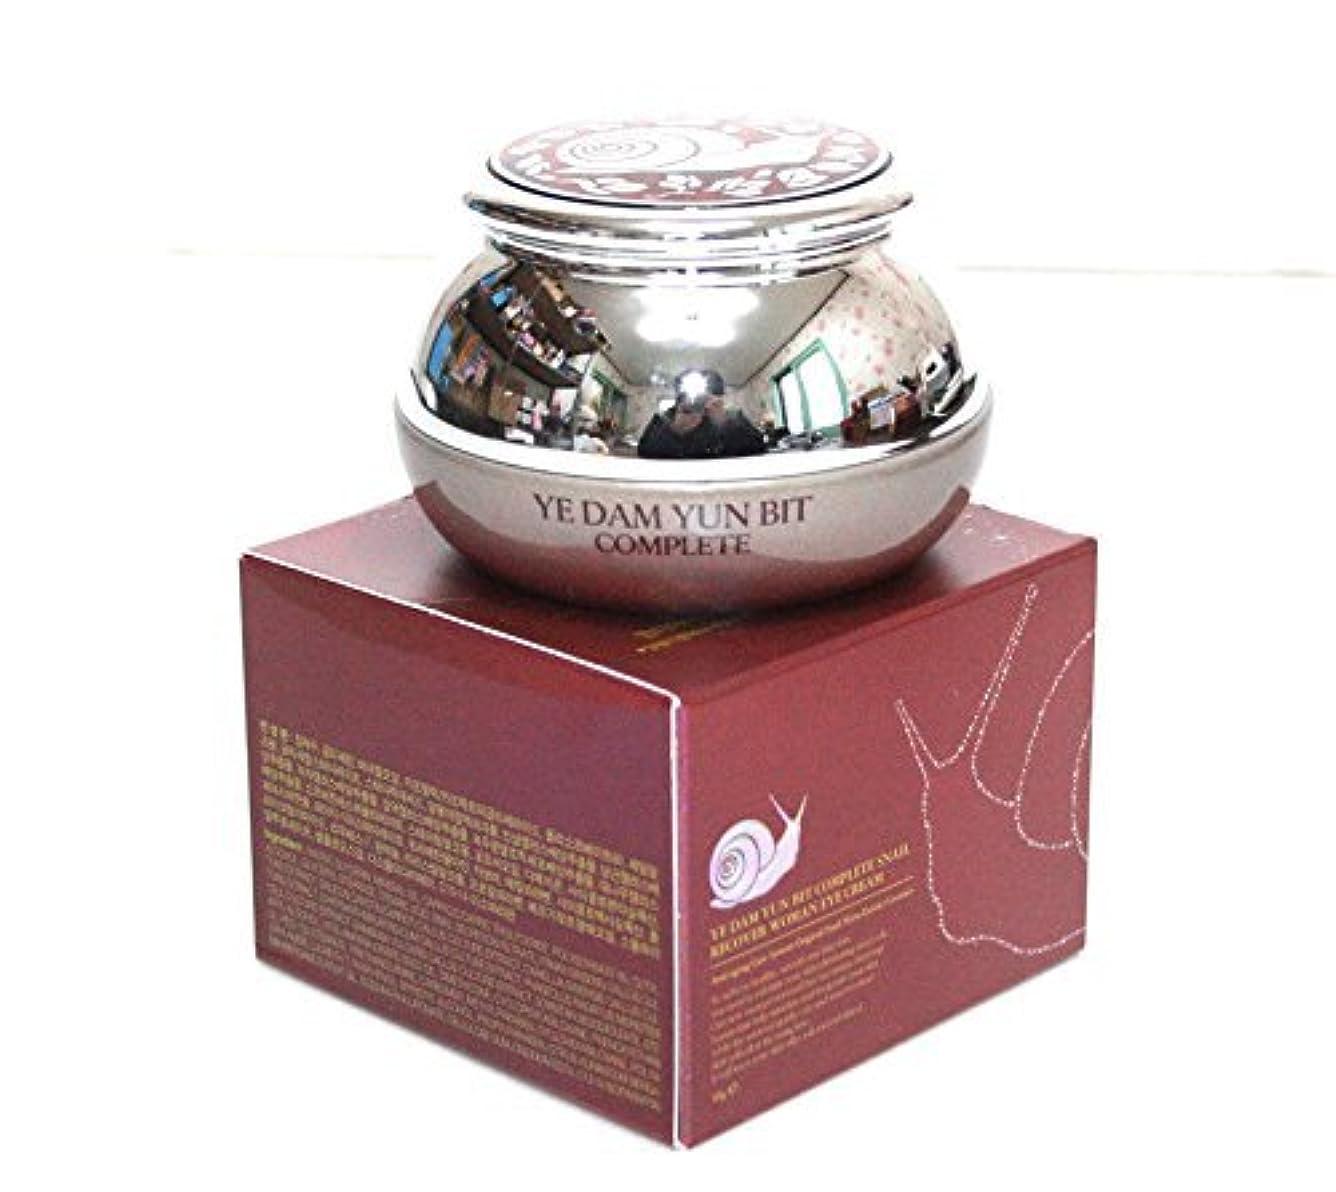 [YEDAM YUN BIT] スキンが完成カタツムリ回復女性のアイクリーム50ml/韓国の化粧品/COMPLETE Skin Snail Recover Woman Eye Cream 50ml/Korean cosmetics...